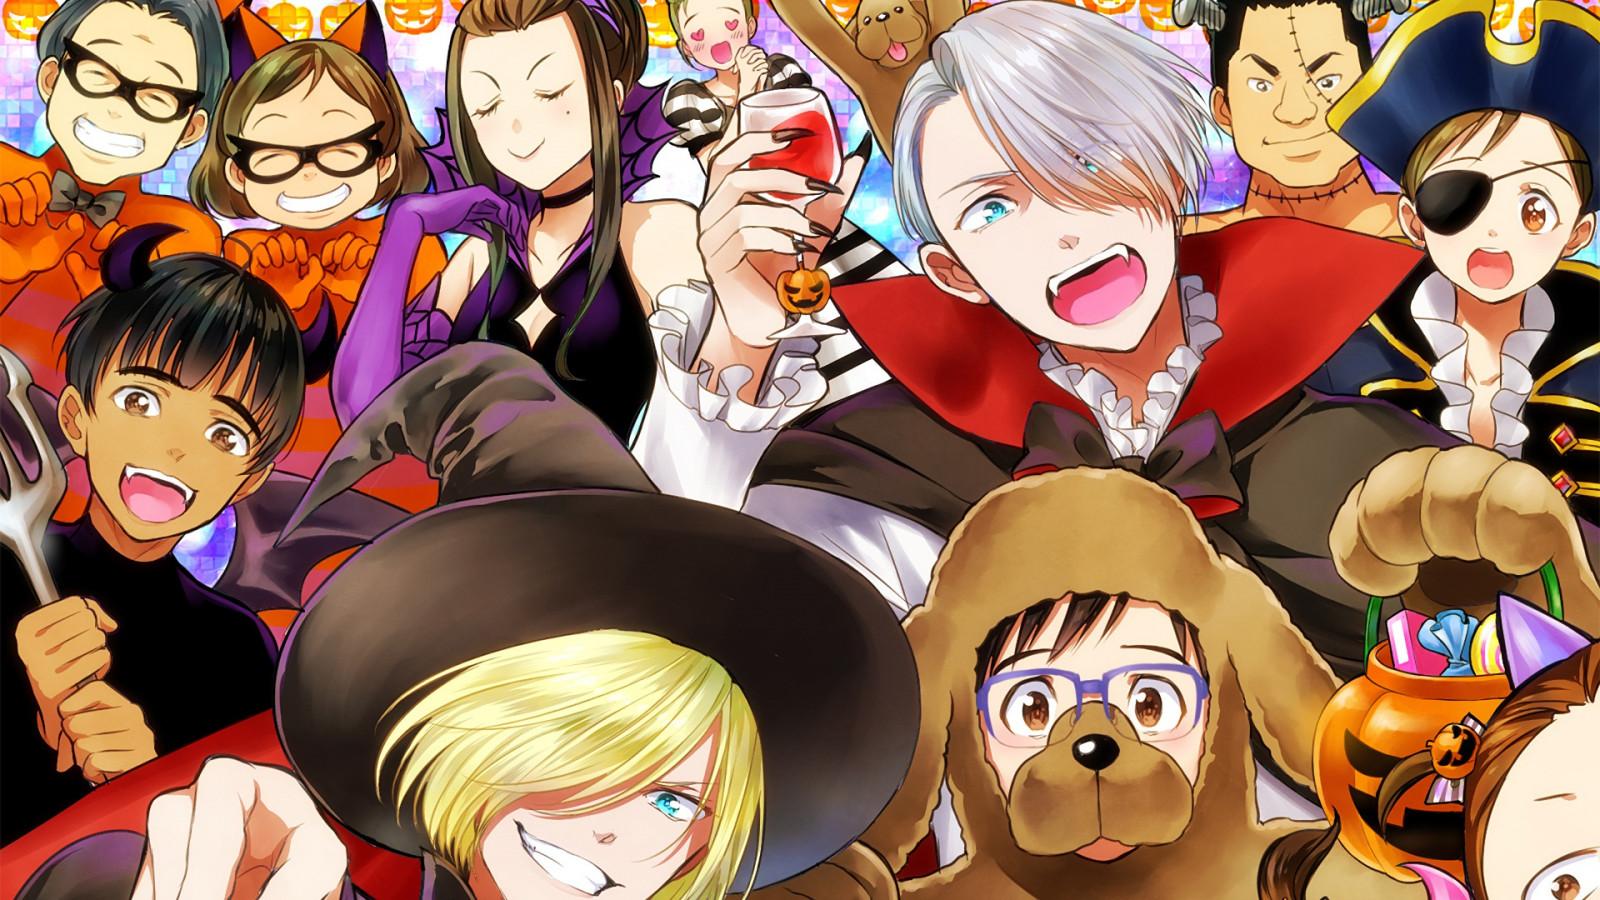 Wallpaper : anime boys, yuri on ice 1920x1080 - MGunz7505 ...